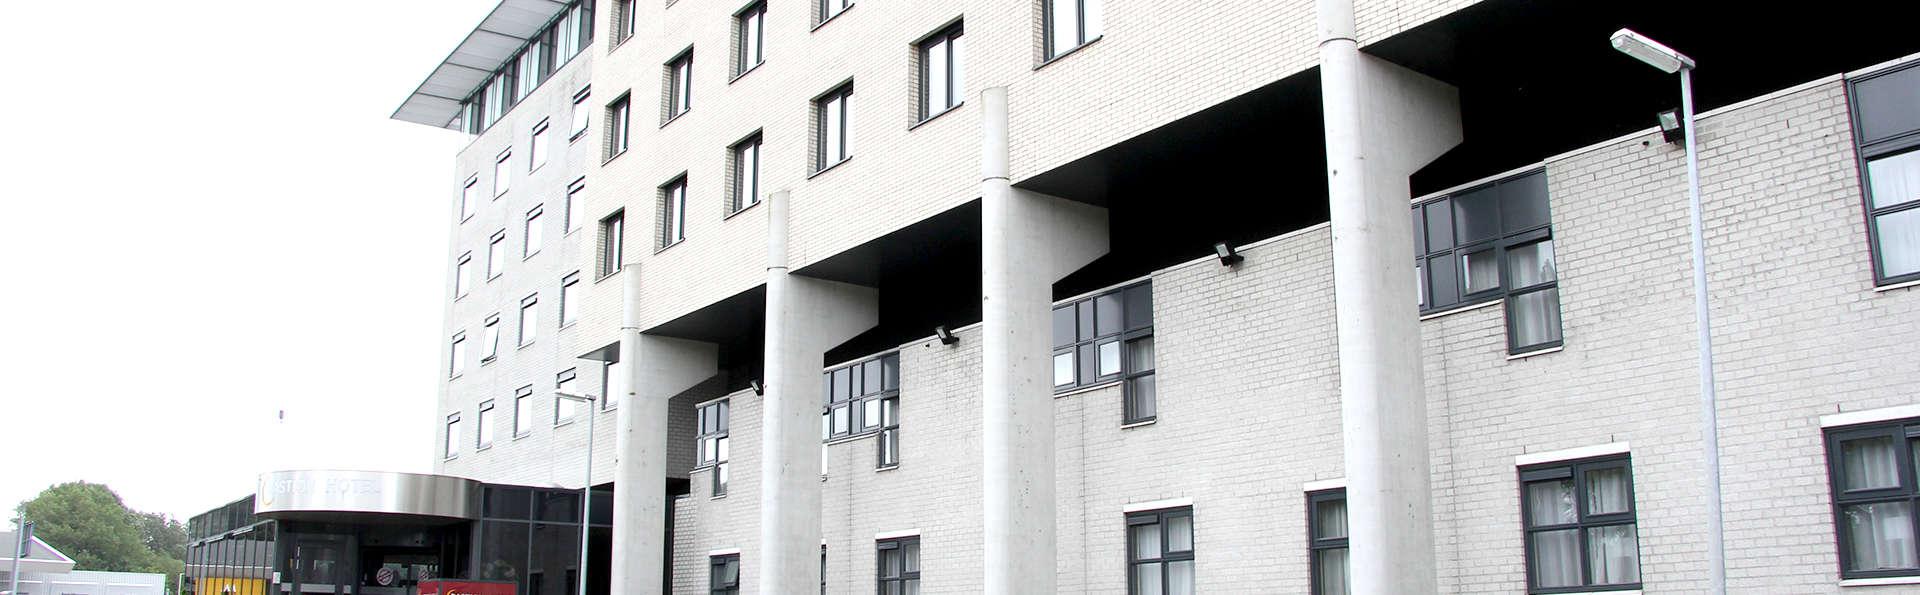 Bastion Hotel Rotterdam Zuid - Edit_Front2.jpg